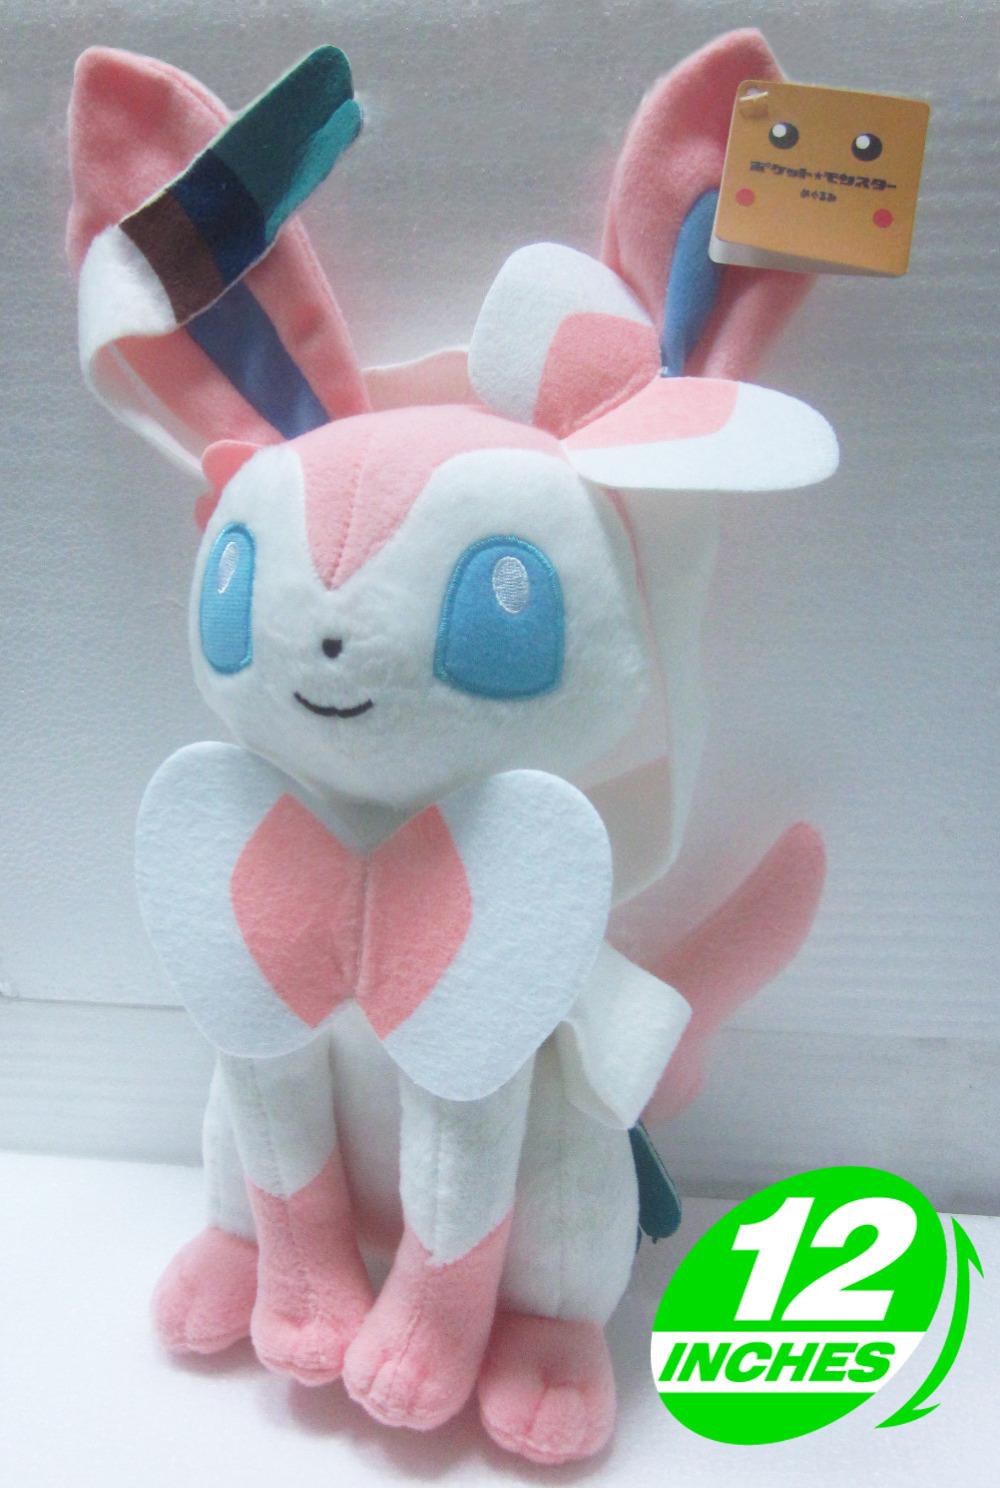 Big Discount! Top Quality Anime Pokemon Sylveon Plush Doll Toys Perfect Gifts Anime Plush Doll Toys PNPL1220(China (Mainland))